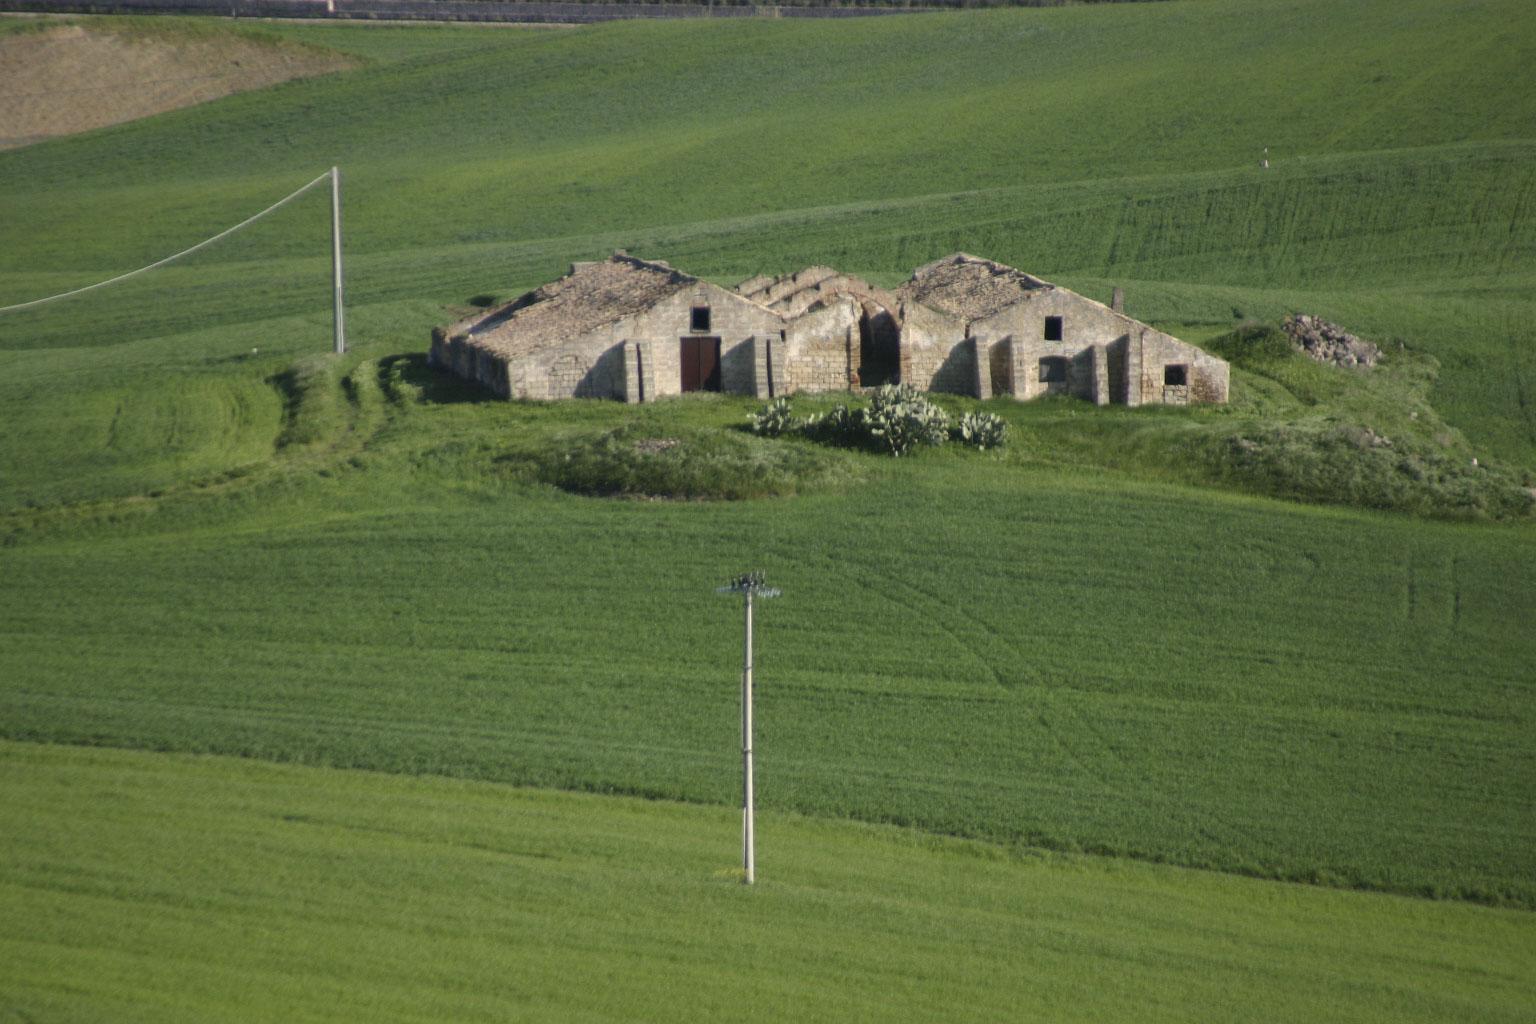 Paesaggio - Panorama con casa rurale